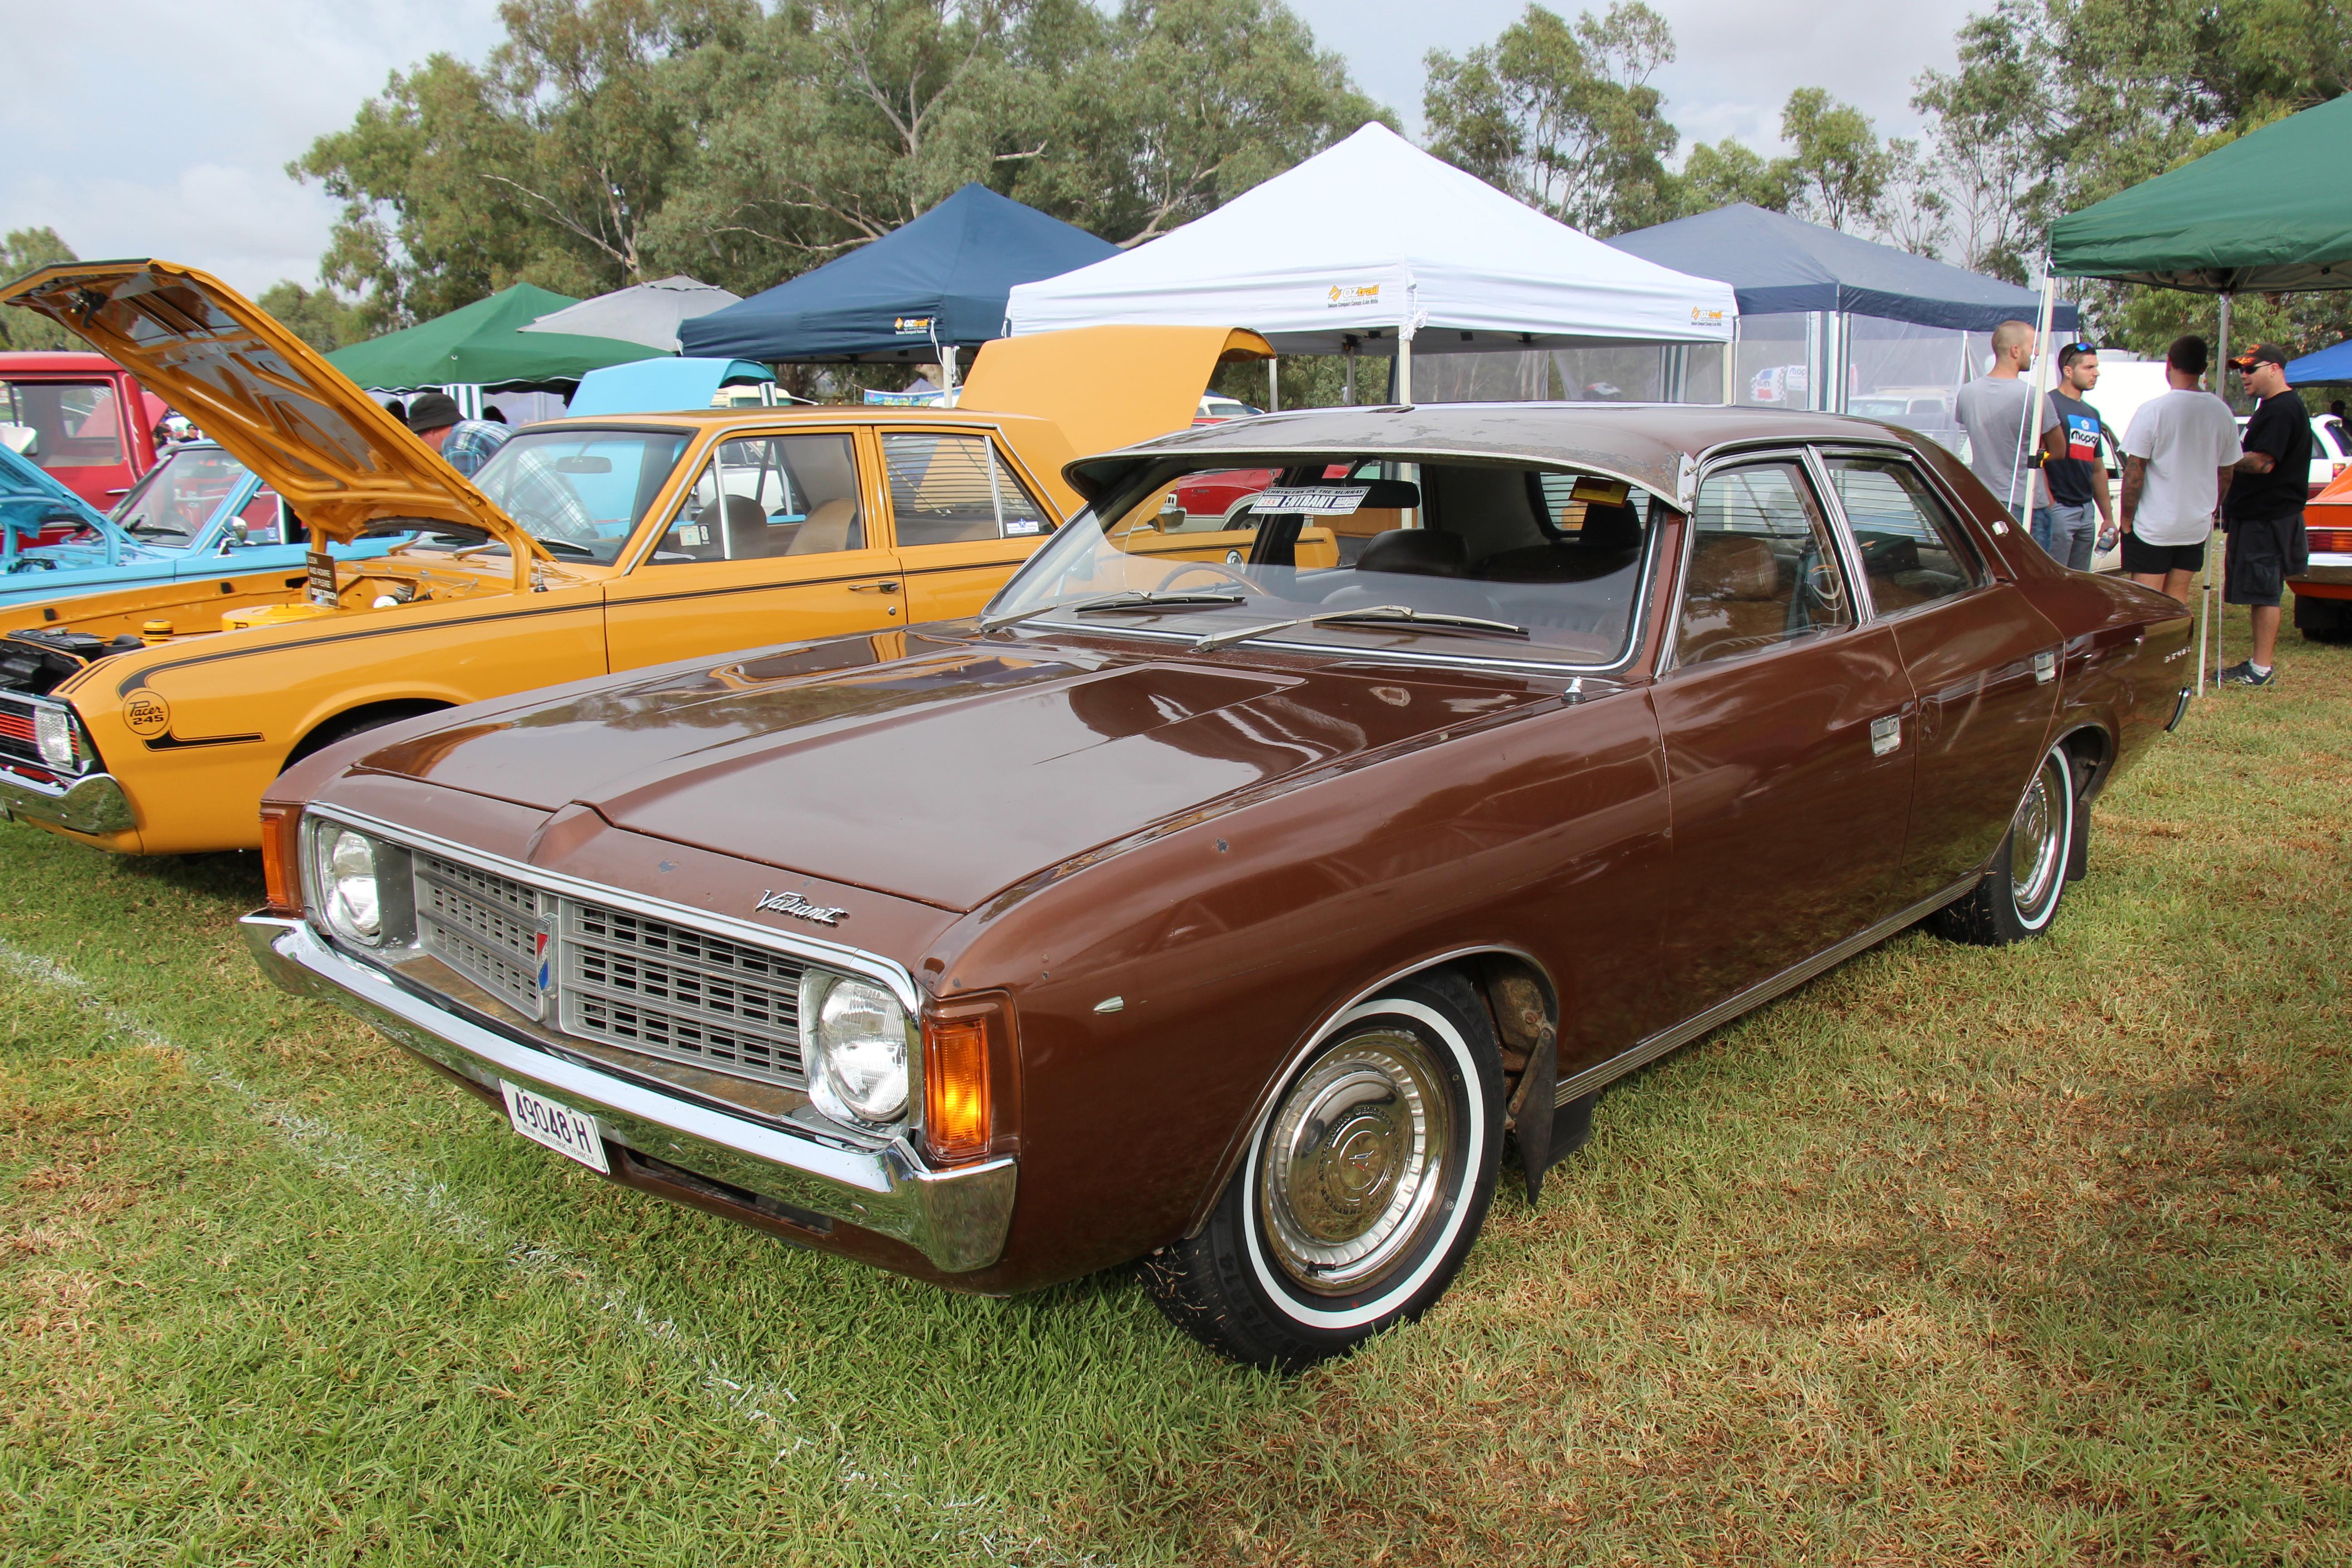 Chrysler Valiant (VJ) - Wikipedia